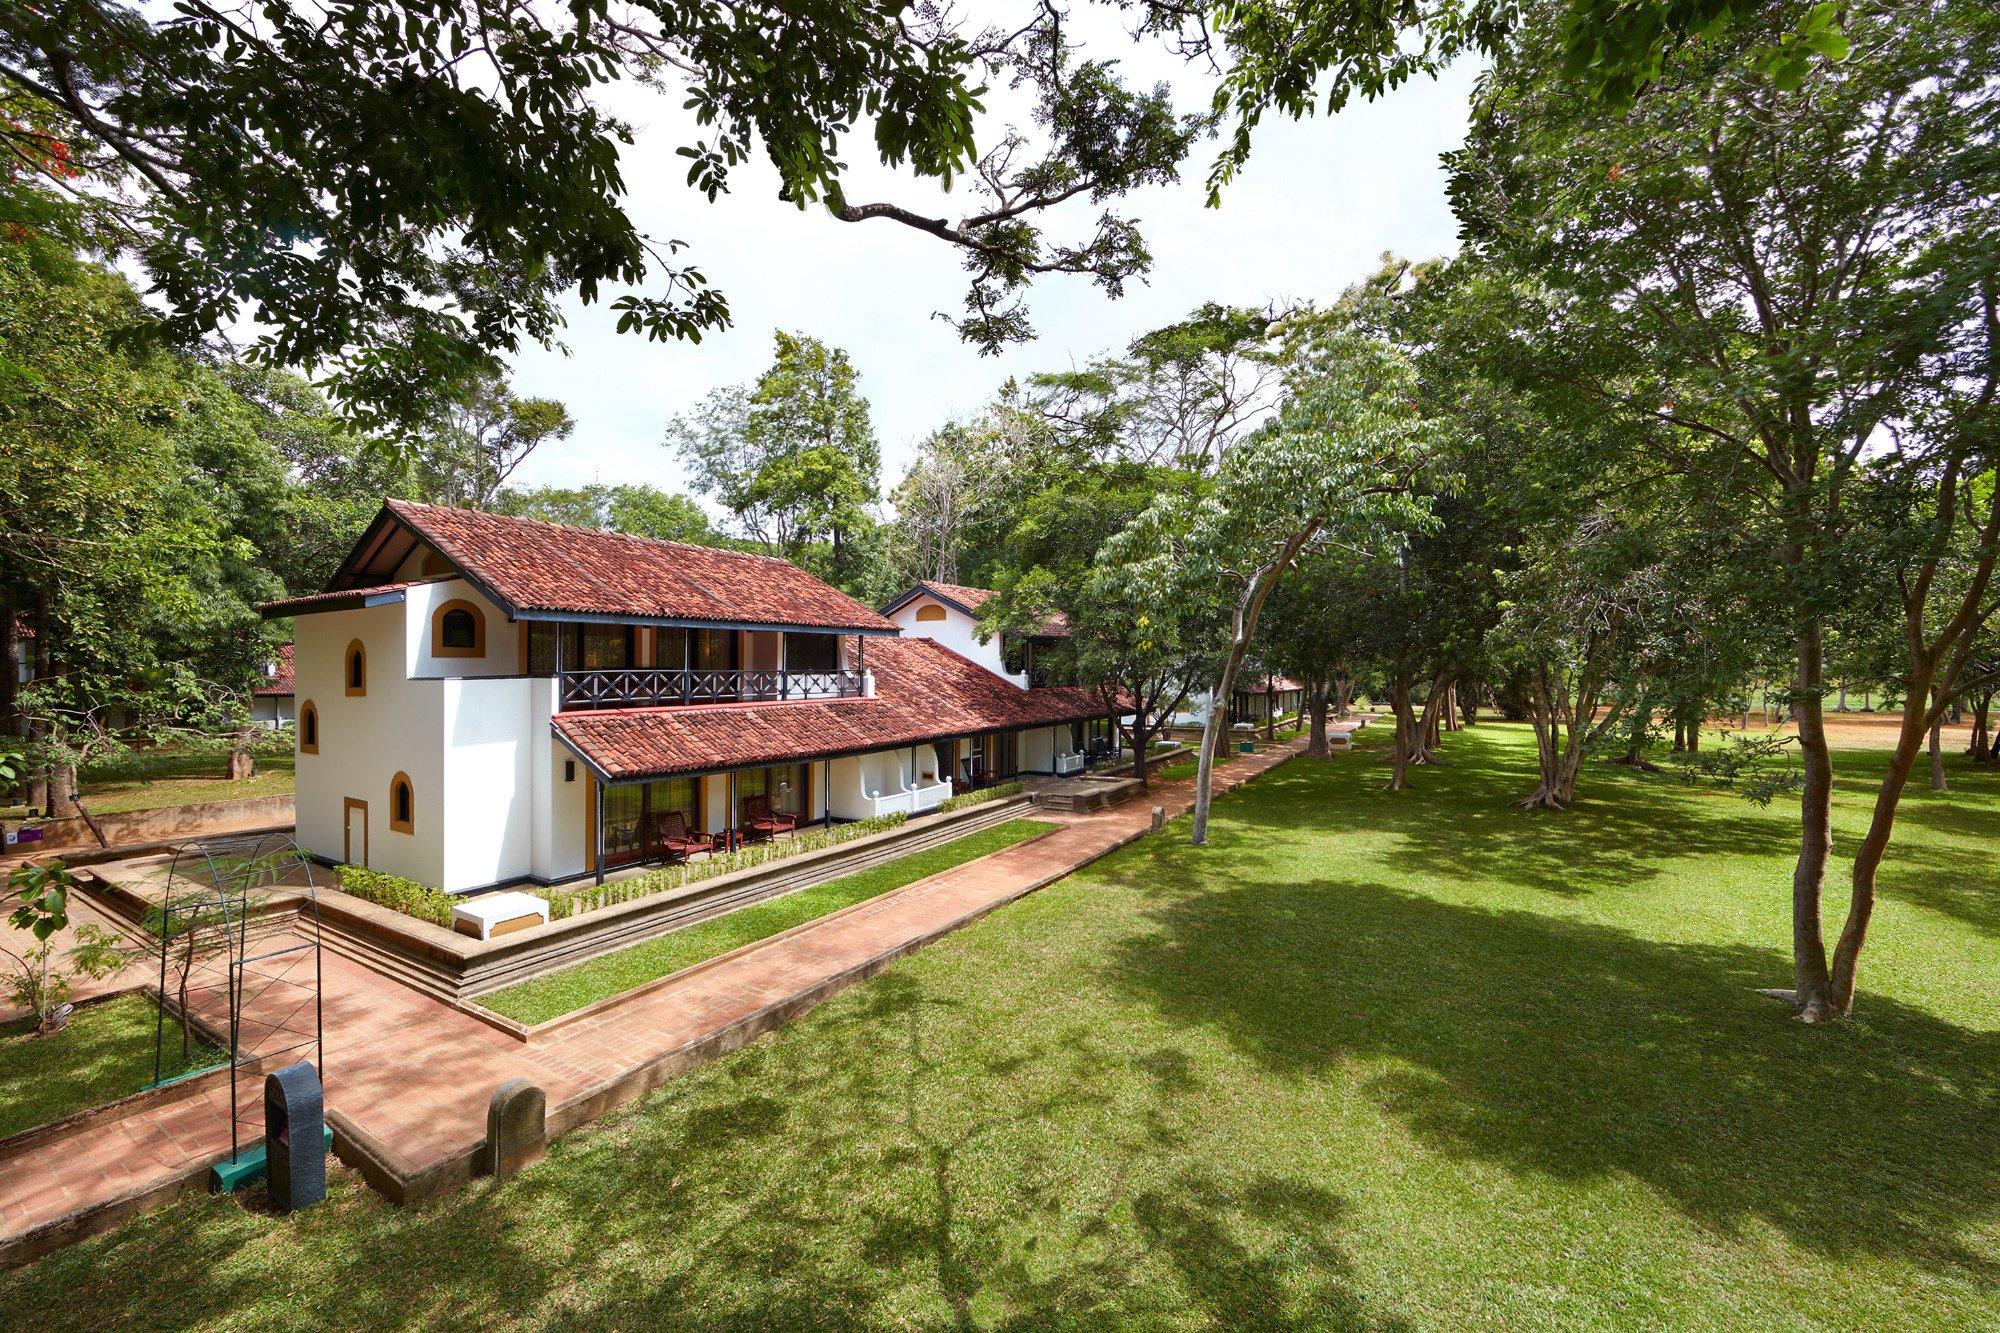 Top Indian wedding planner for Weddings in Galle, Weligama, Bentota, Kalutara. Thinking of a Sri Lanka wedding? Call/WA +919910325805 | +919899744727 now!